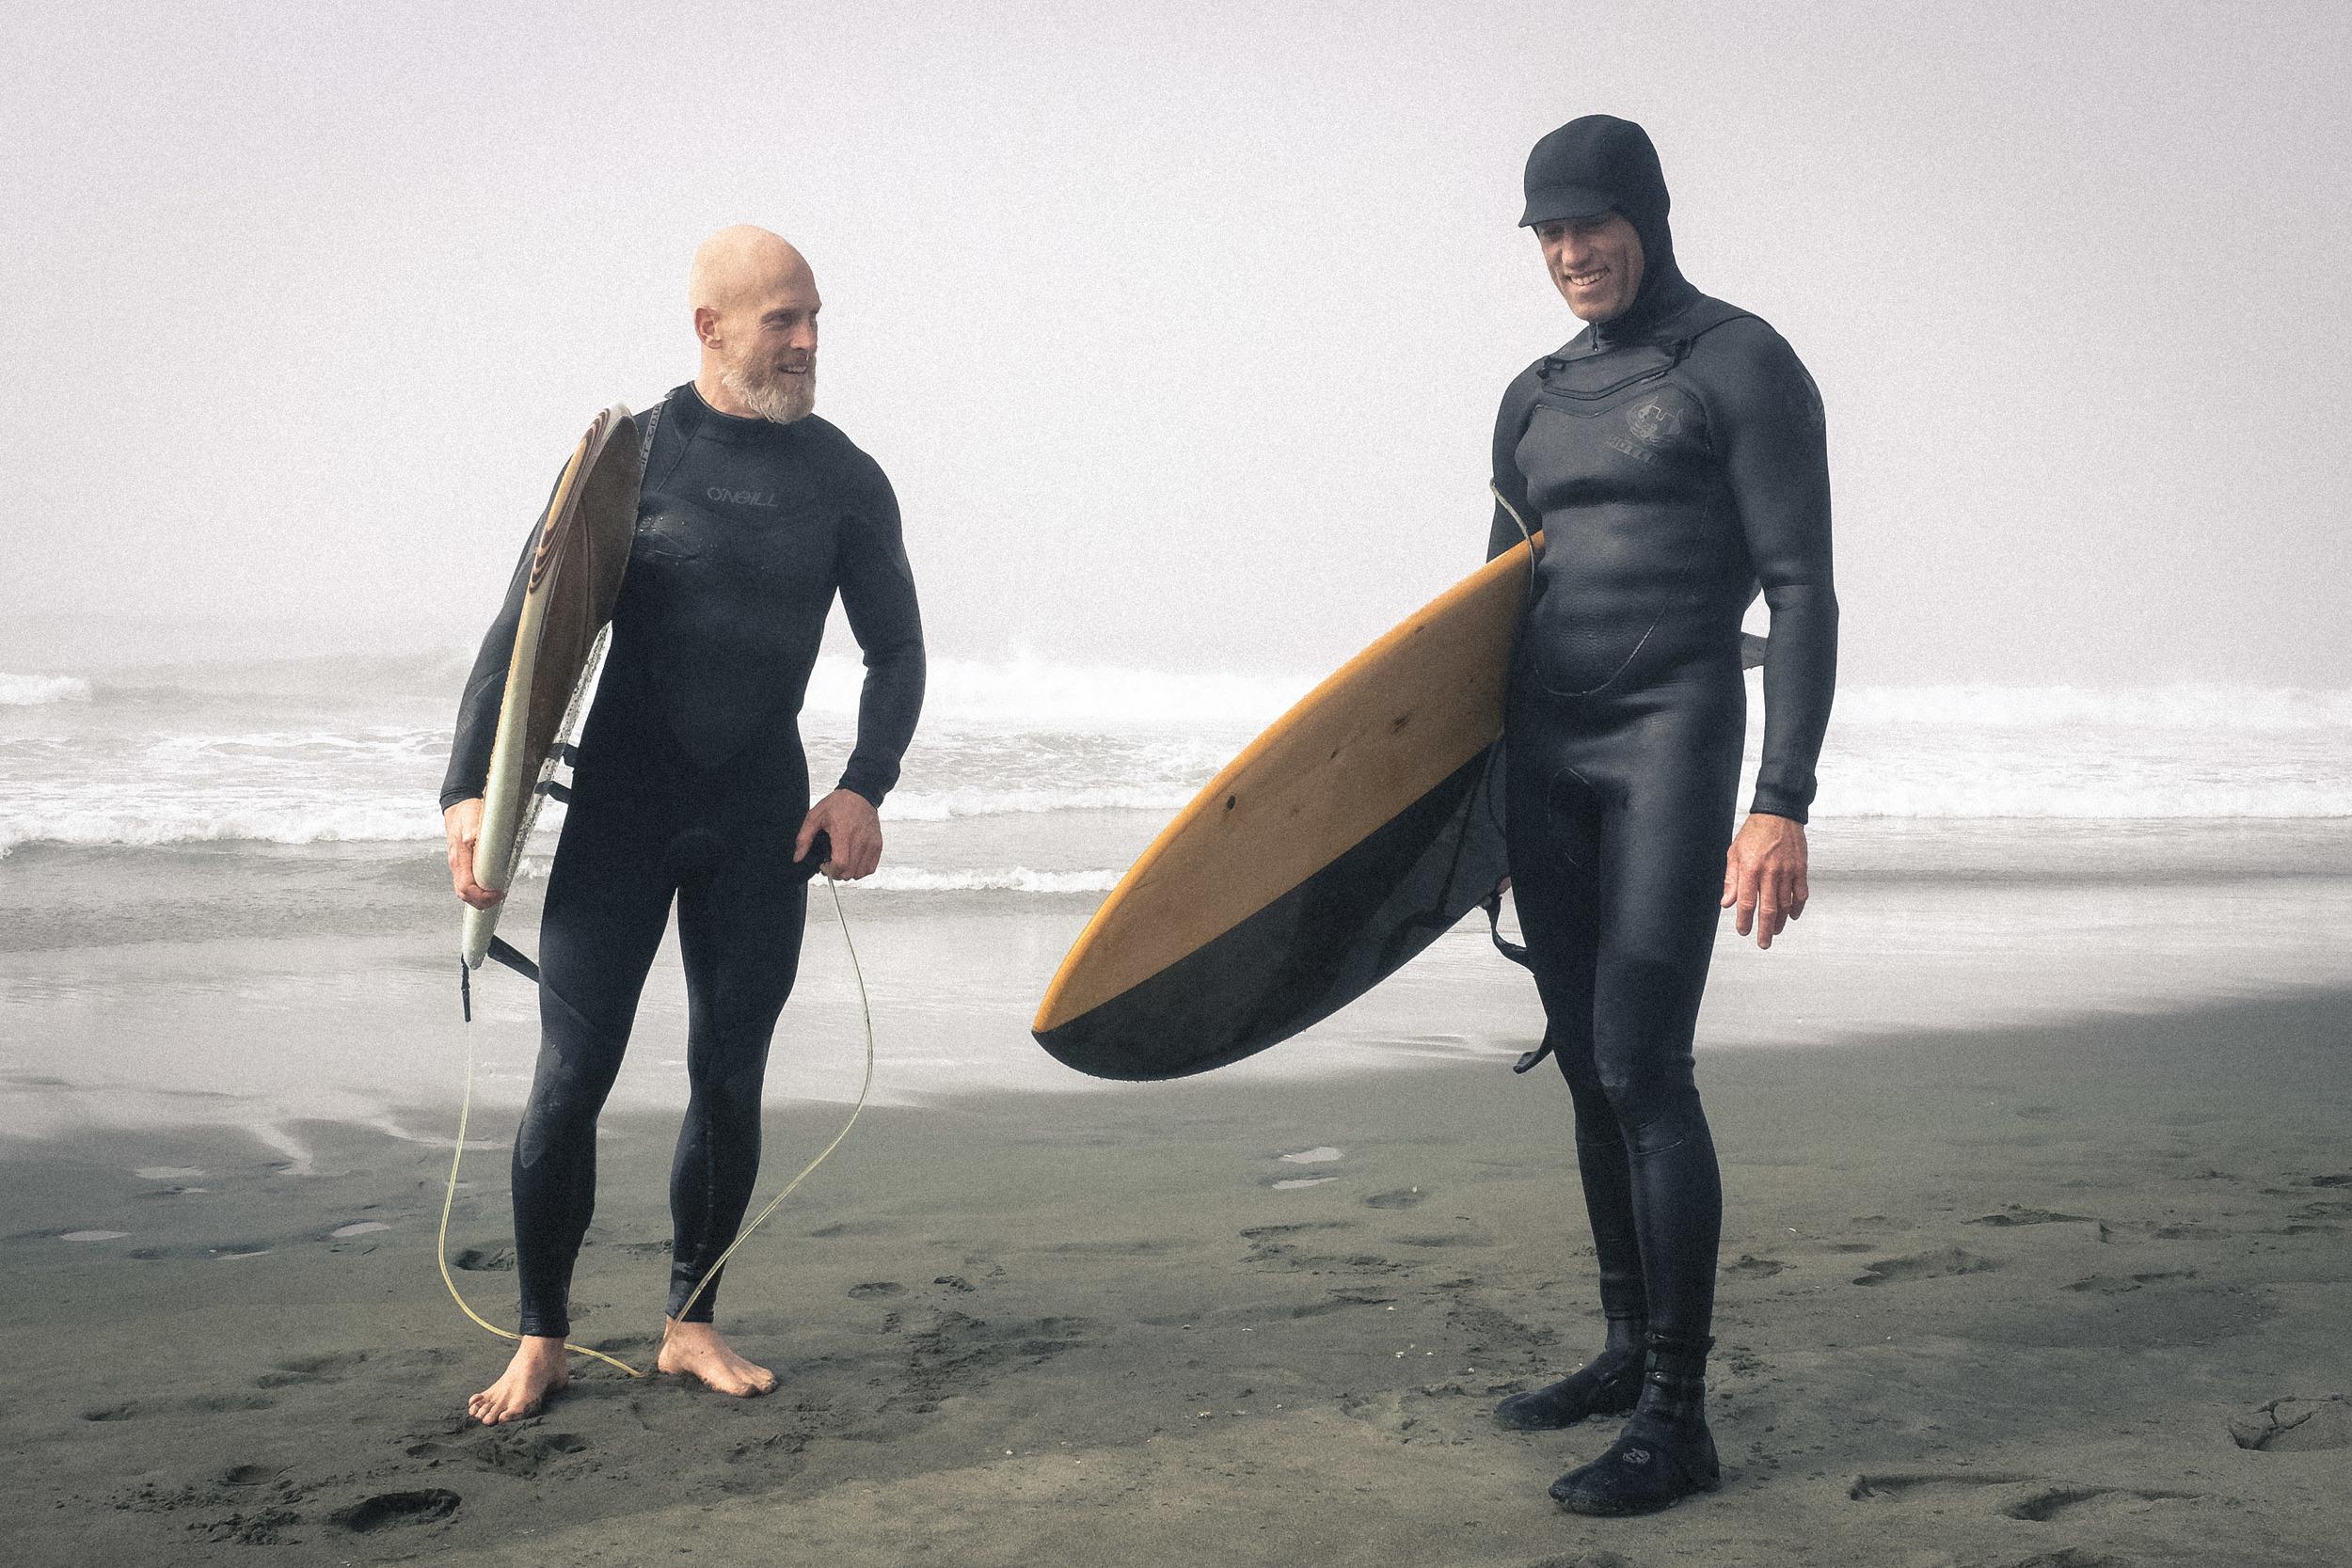 Black-Bear-Brand-Tilley-Surfboards-Water-Testing-05.jpg